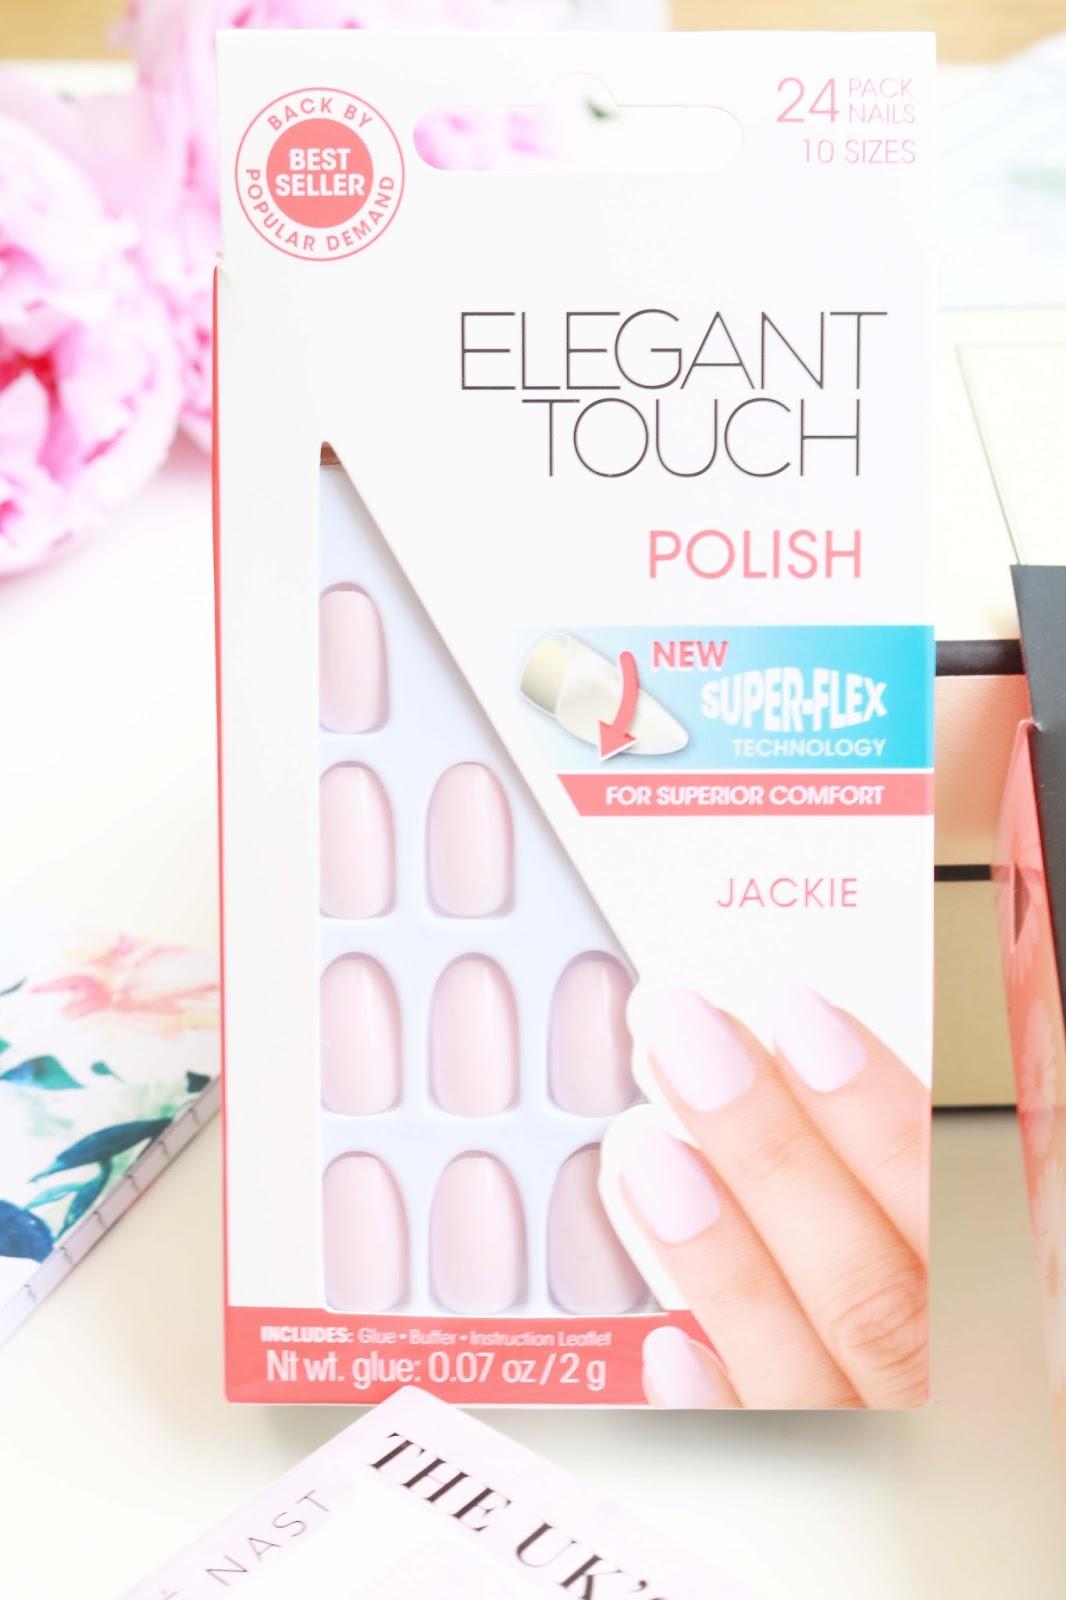 Beauty, Nails, Elegant Touch nails, Press On Nails, Drugstore, Elegant Touch Jackie, False nails, wedding beauty